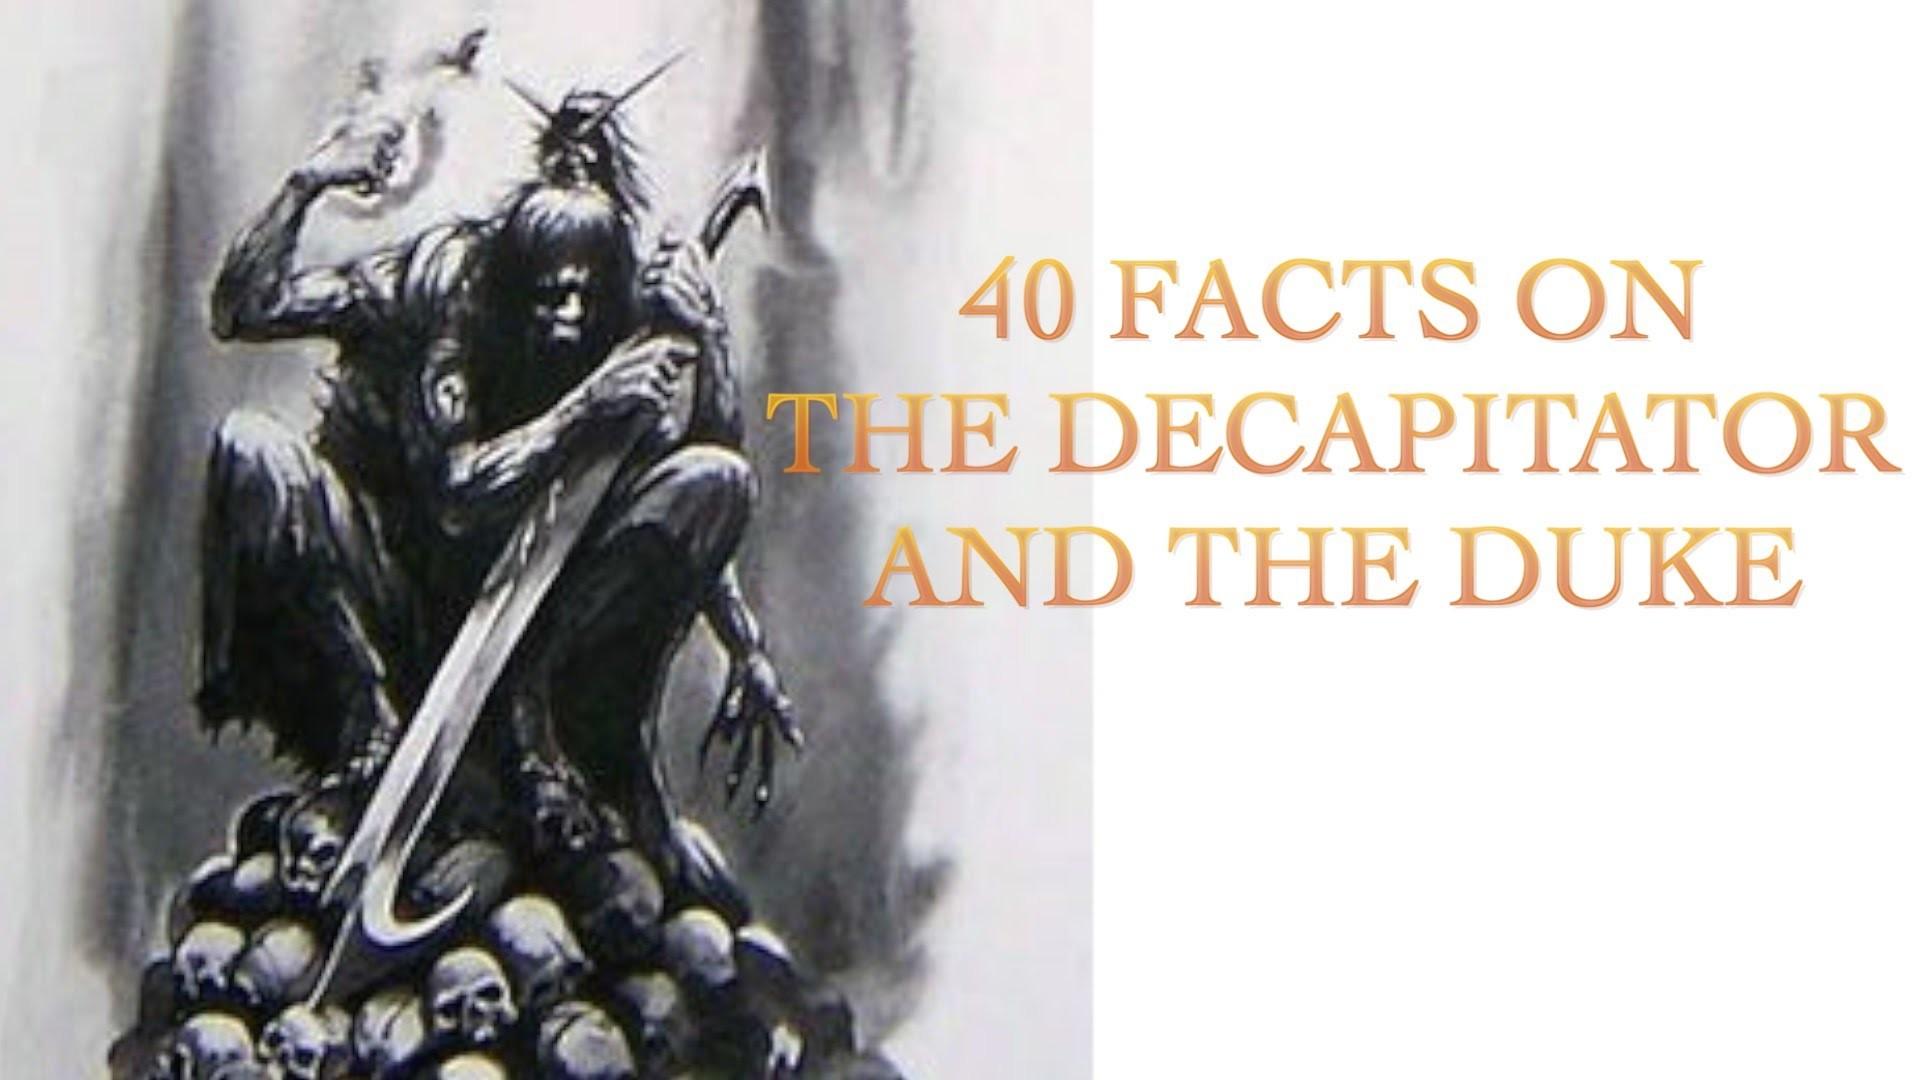 40 Facts and Lore on the Decapitator & the Duke of the Dark Eldar Warhammer  40k